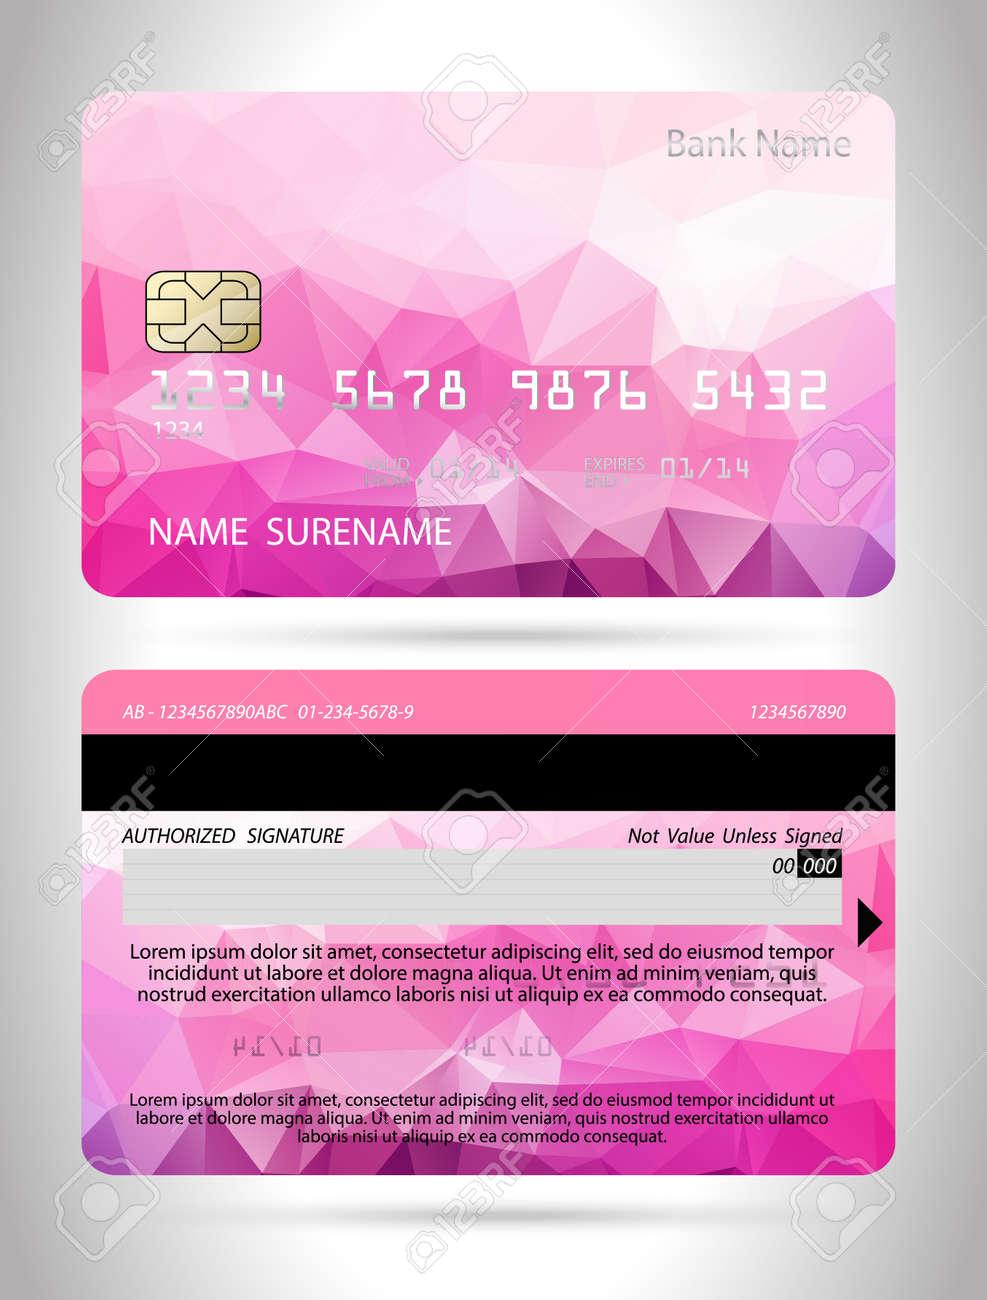 Хоум кредит кредитные карты онлайн